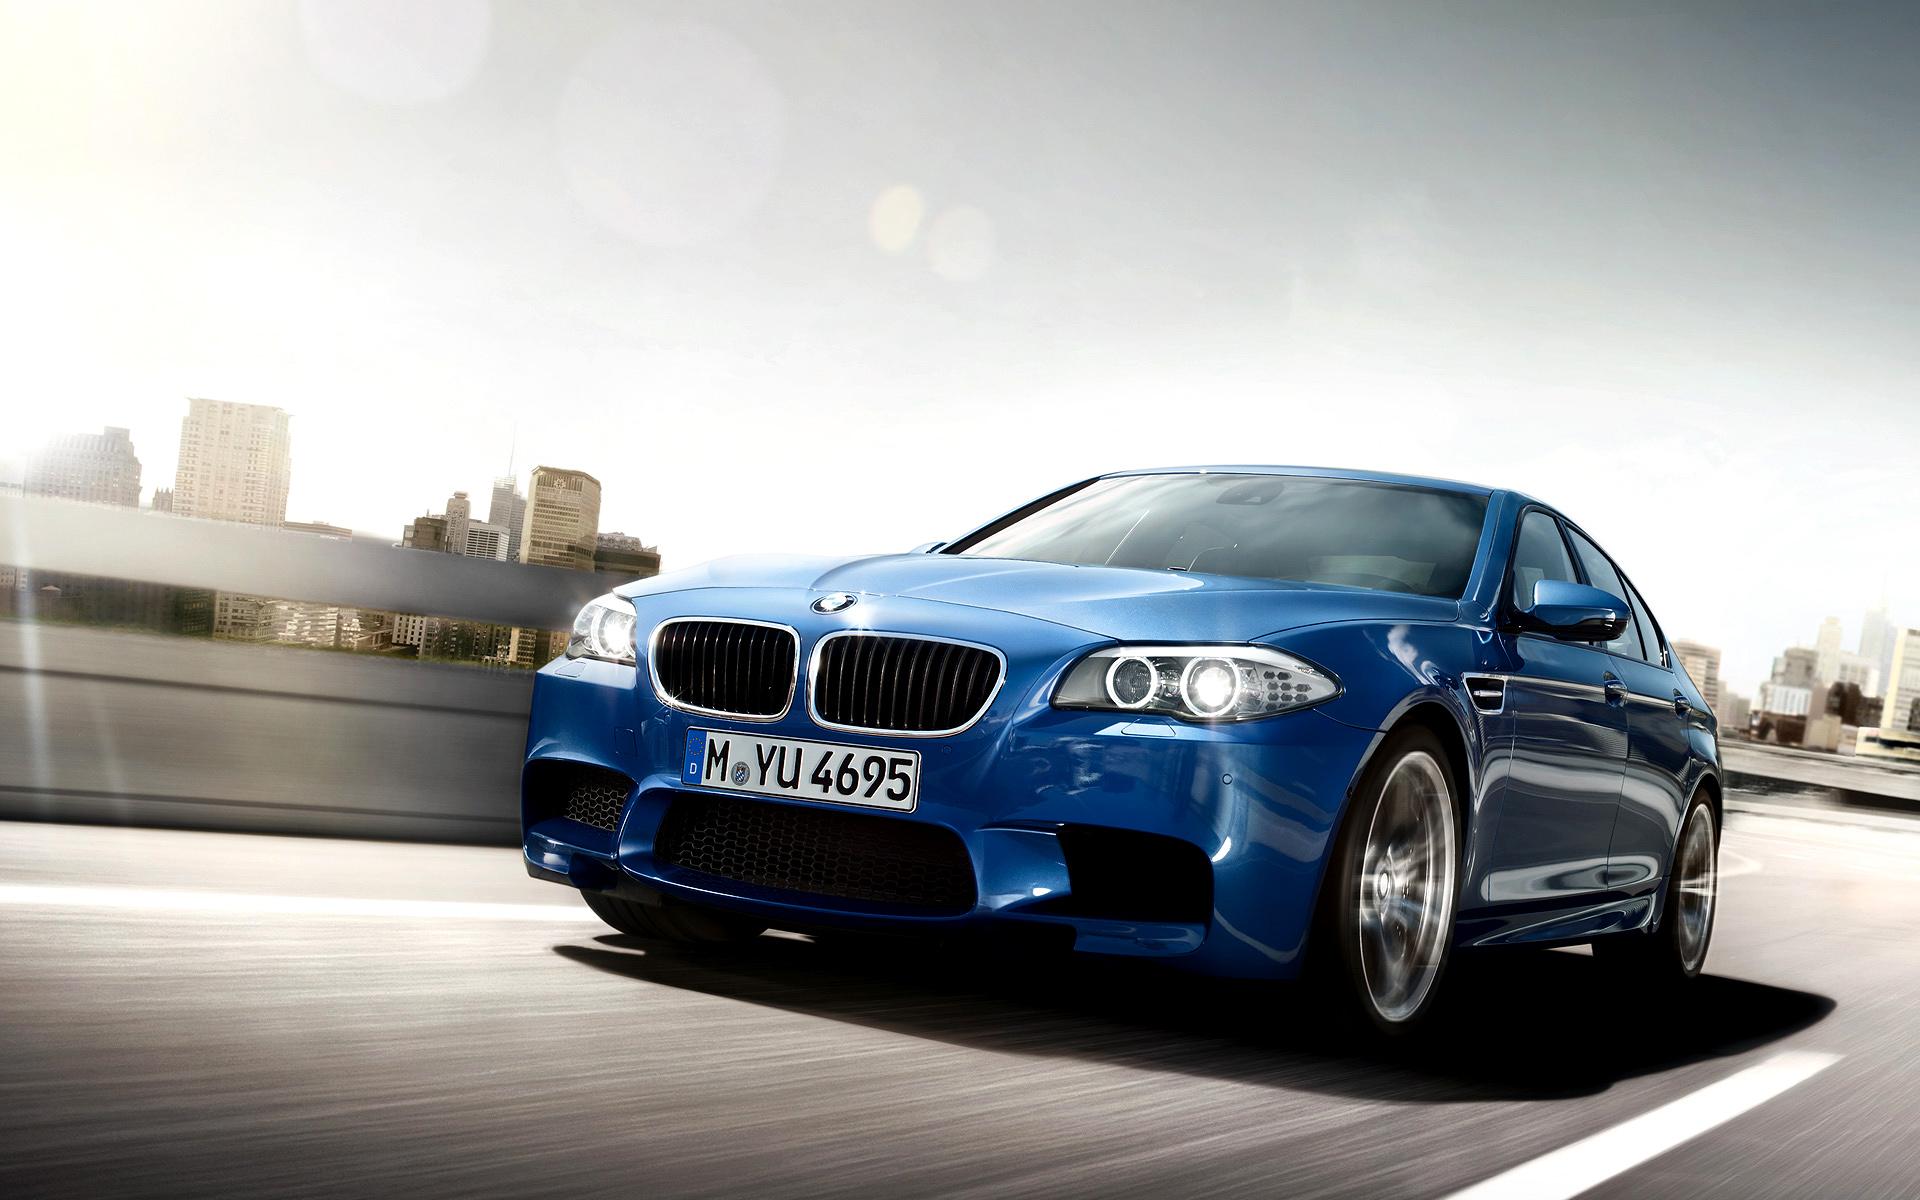 BMW F10 M5 High Quality Wallpapers 1920x1200 wallpaper 01 1920x1200